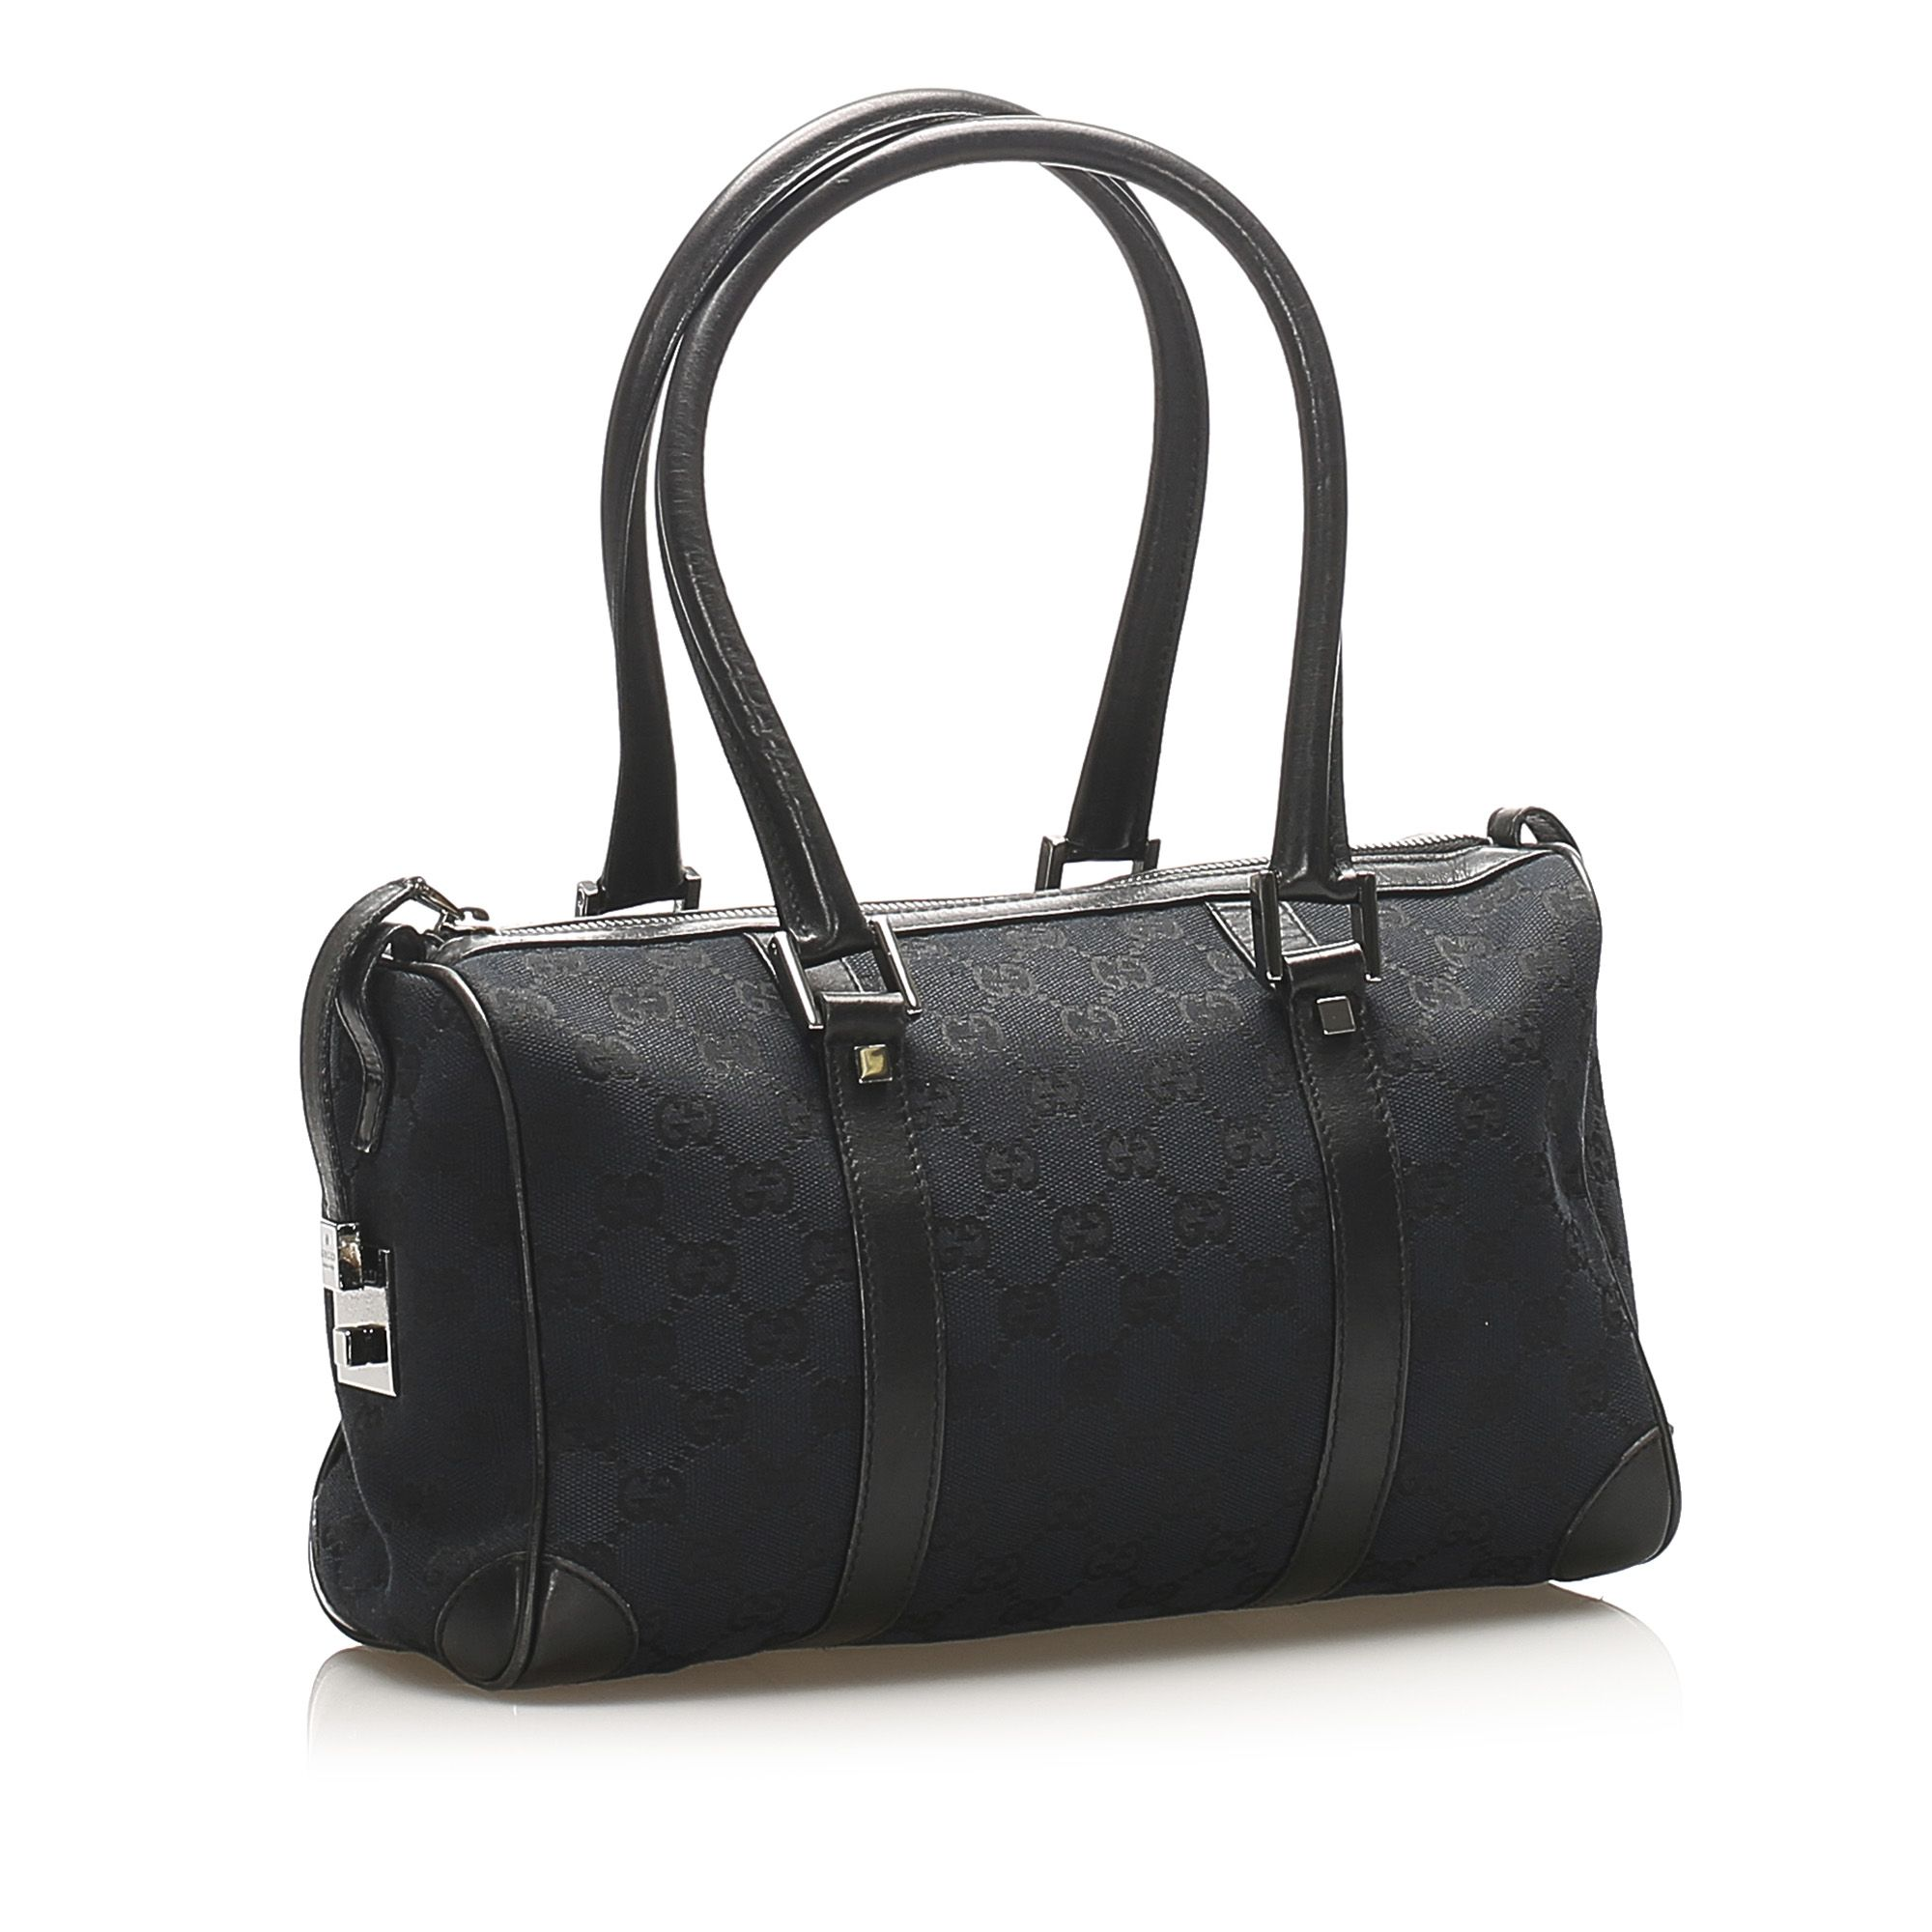 Vintage Gucci GG Canvas Boston Bag Black